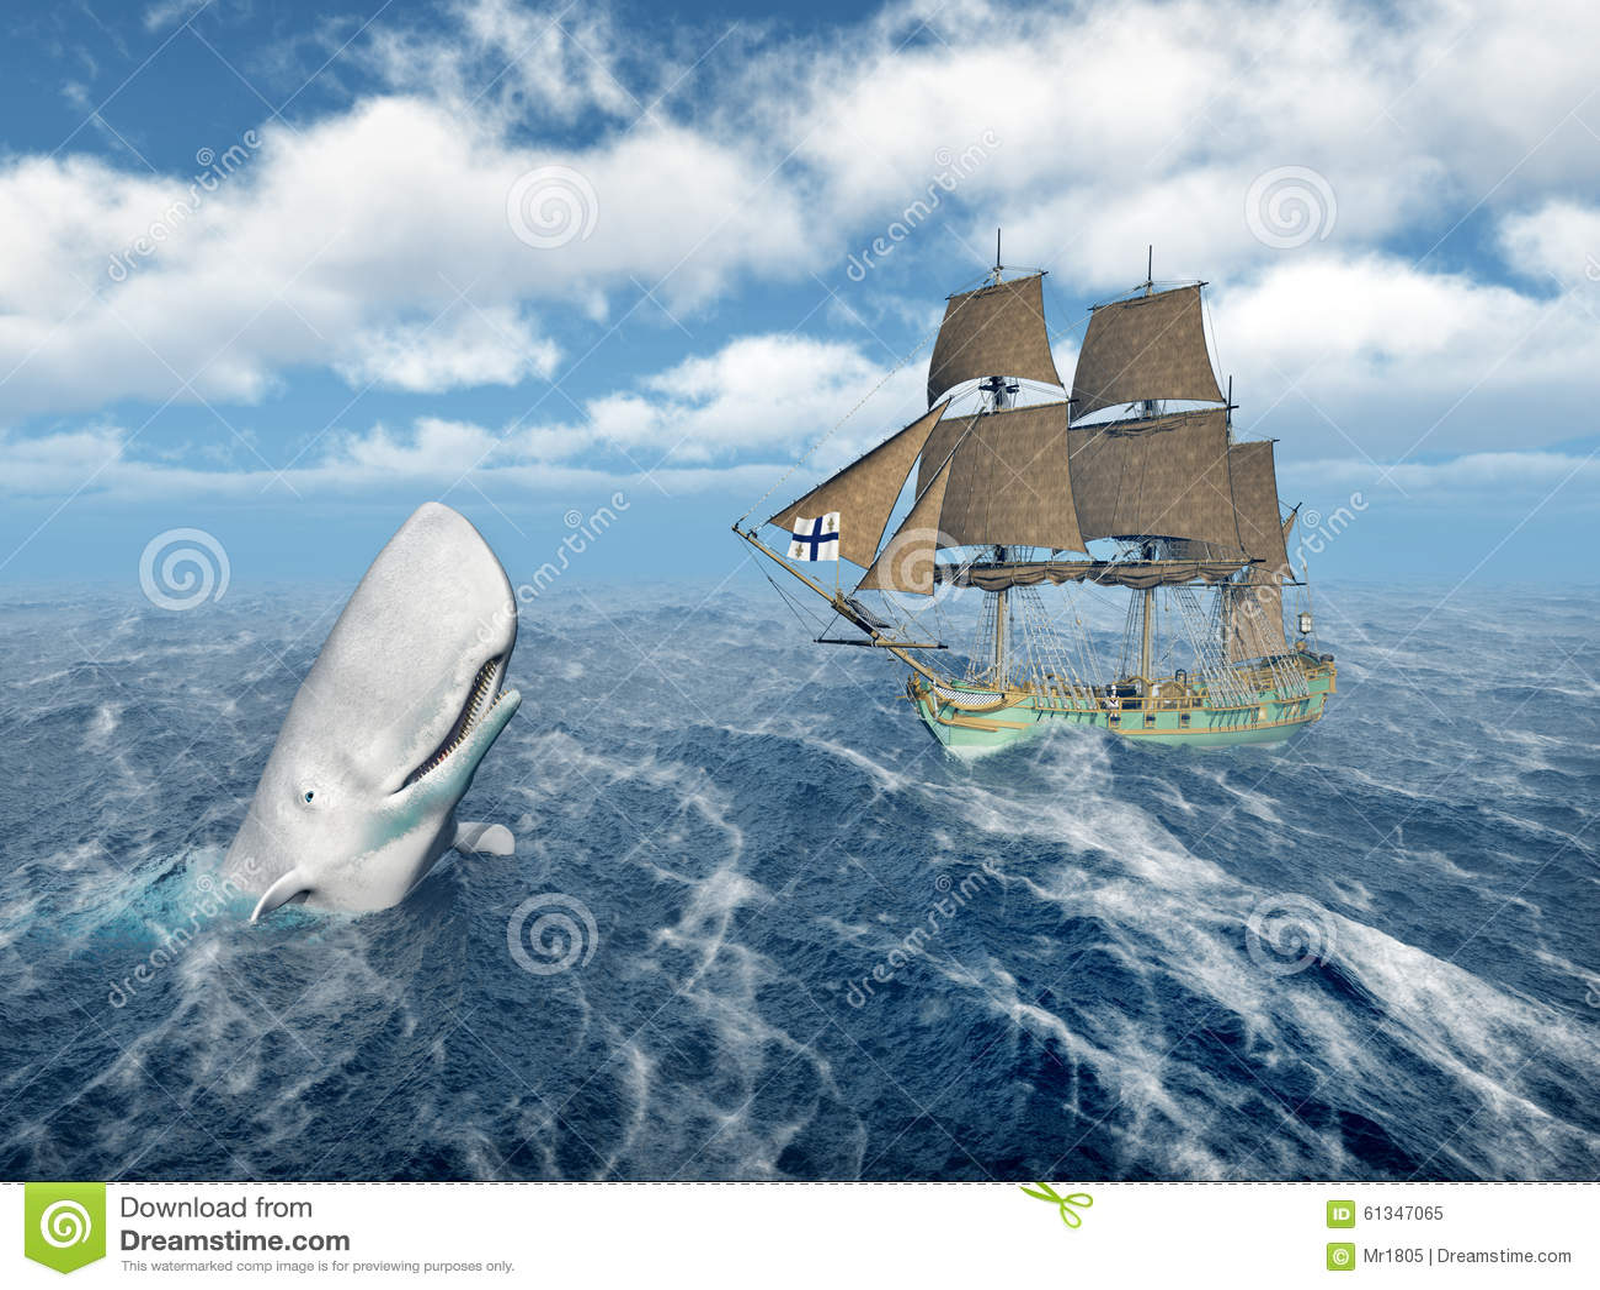 sperm whale sailboat